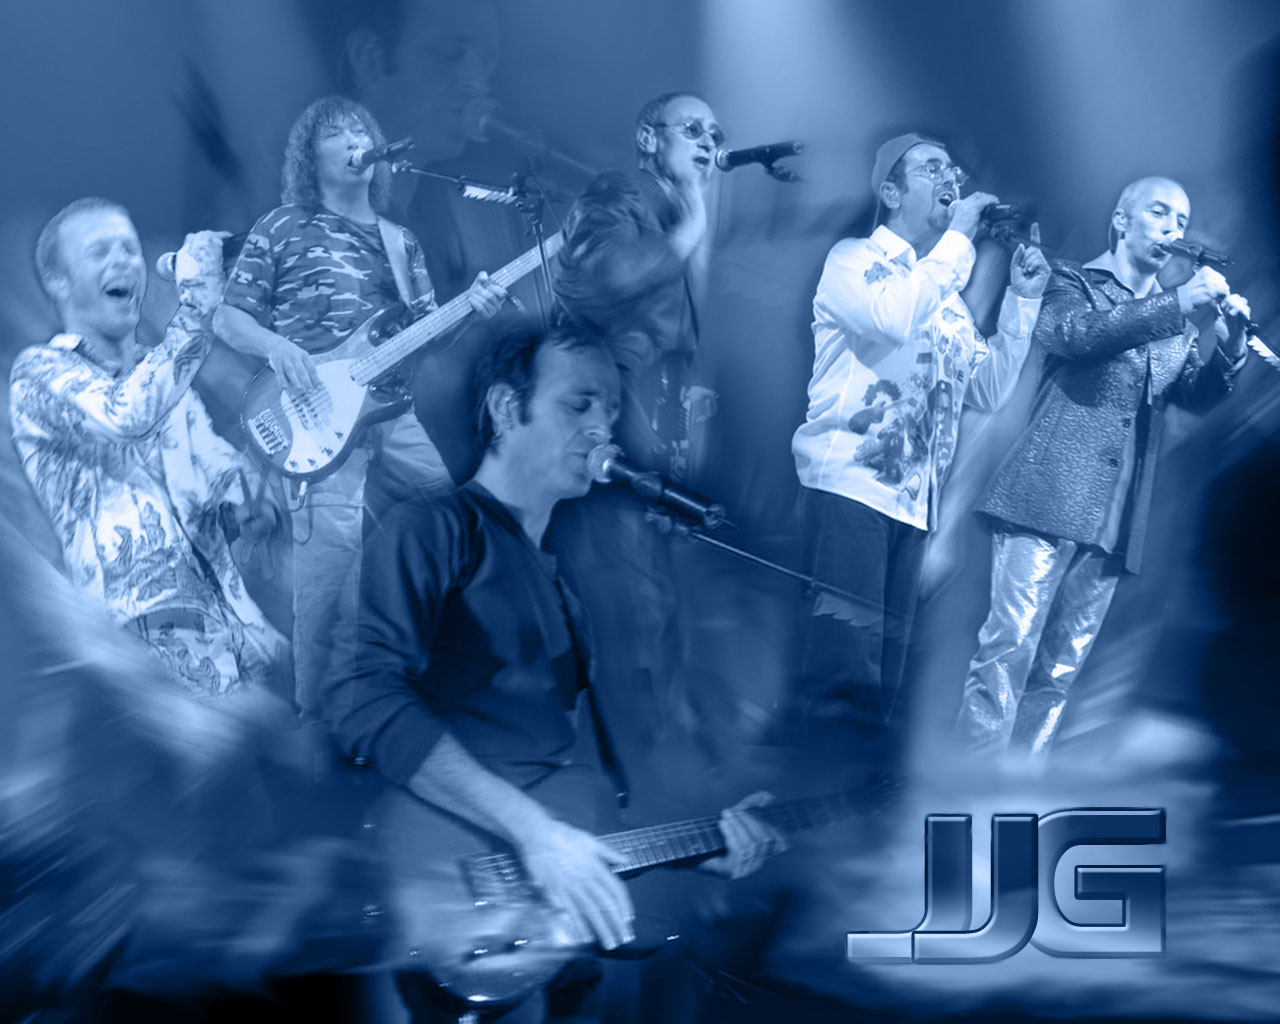 https://static.blog4ever.com/2012/09/713297/Musiciens.jpg